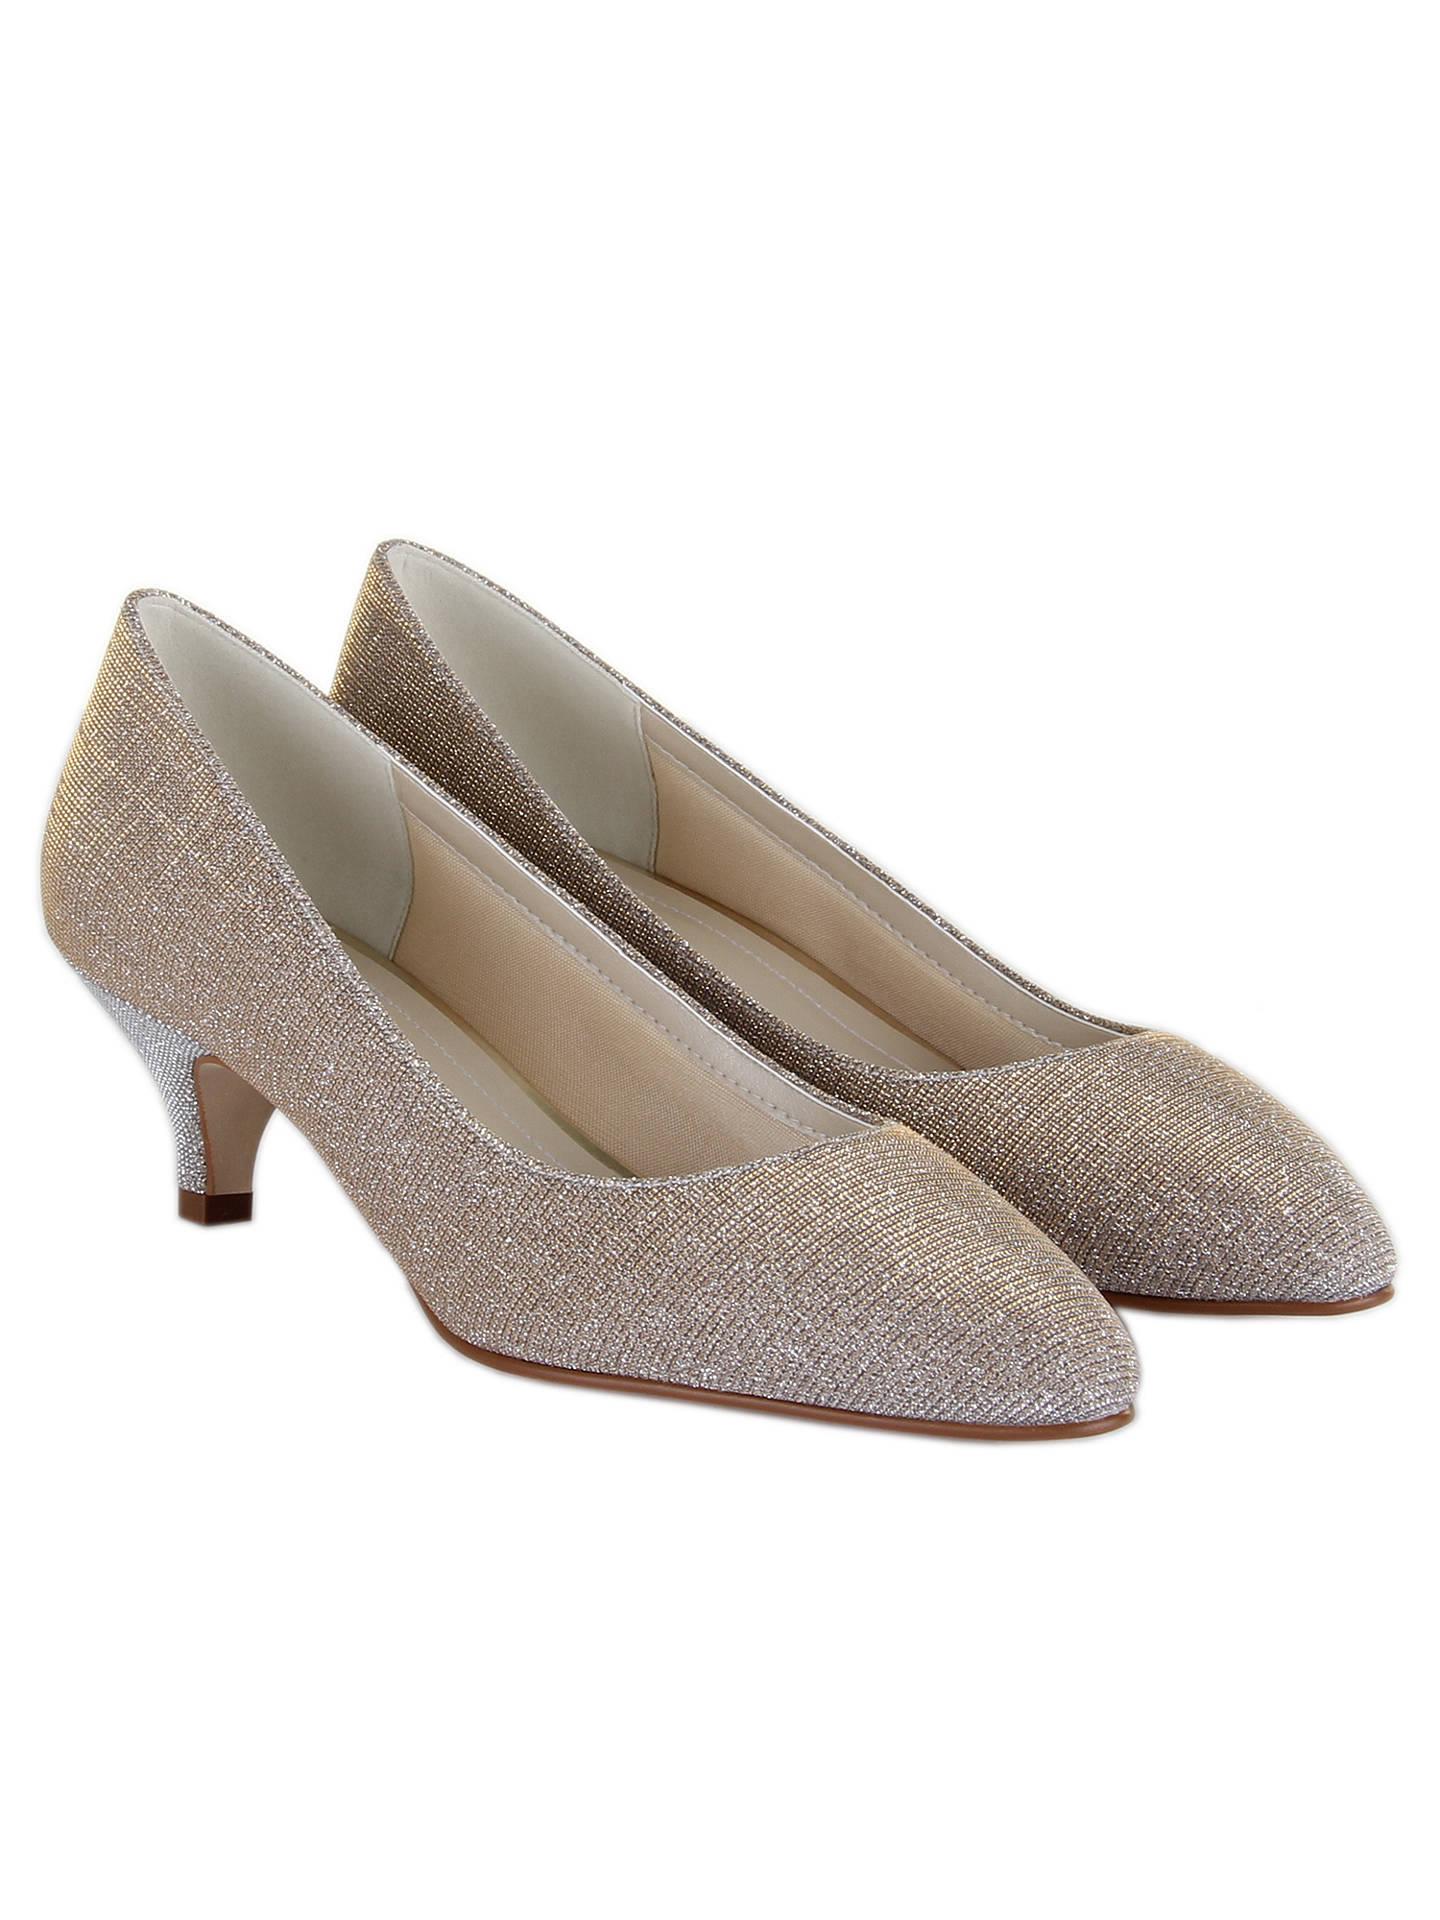 ab42139c60f ... Buy Rainbow Club Winnie Sparkly Court Shoes